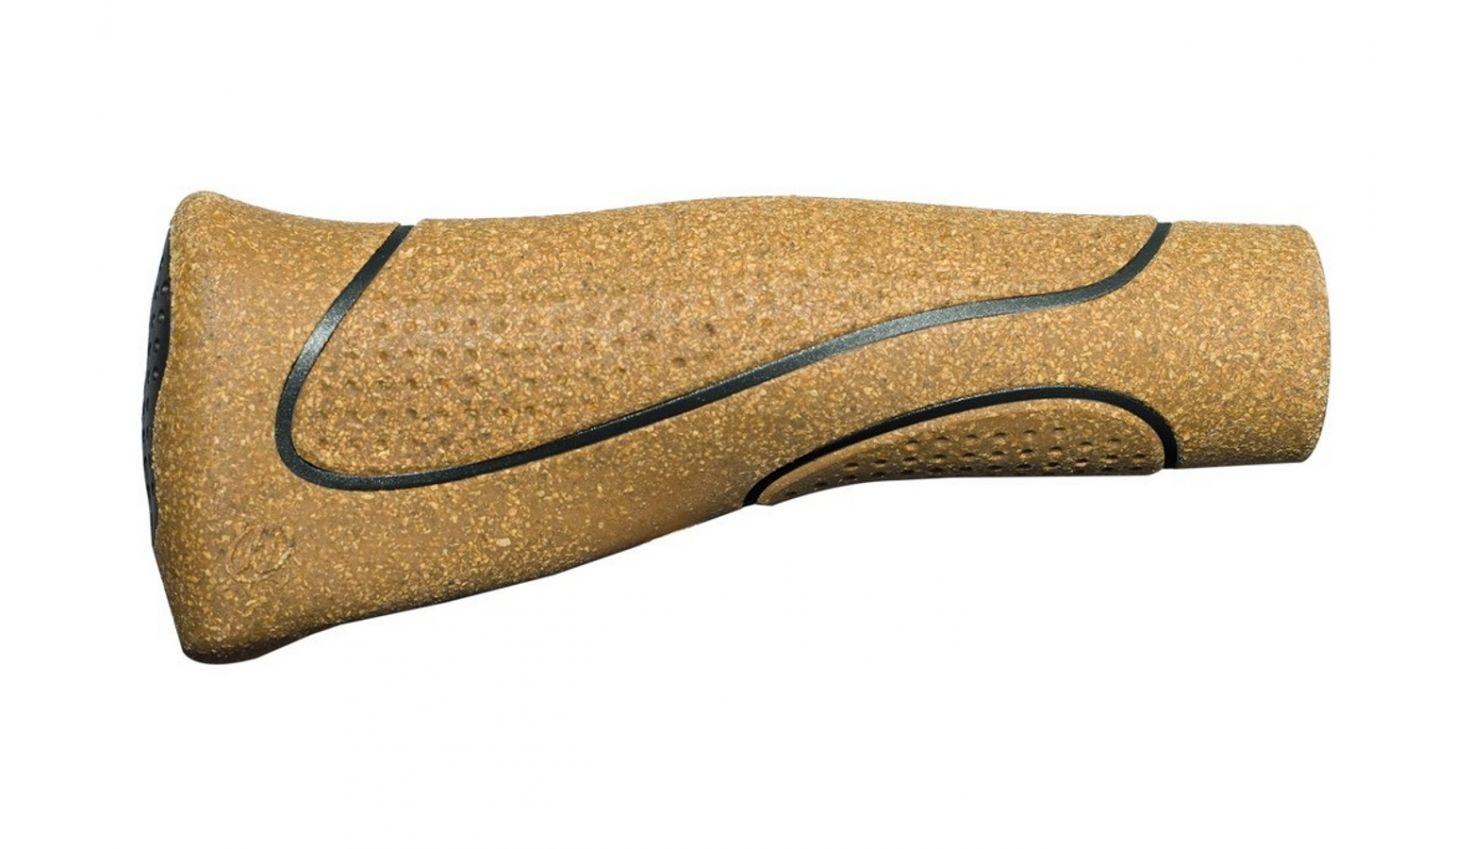 herrmans lenkergriffe primergo jet g nstig kaufen leise pinterest g nstig. Black Bedroom Furniture Sets. Home Design Ideas